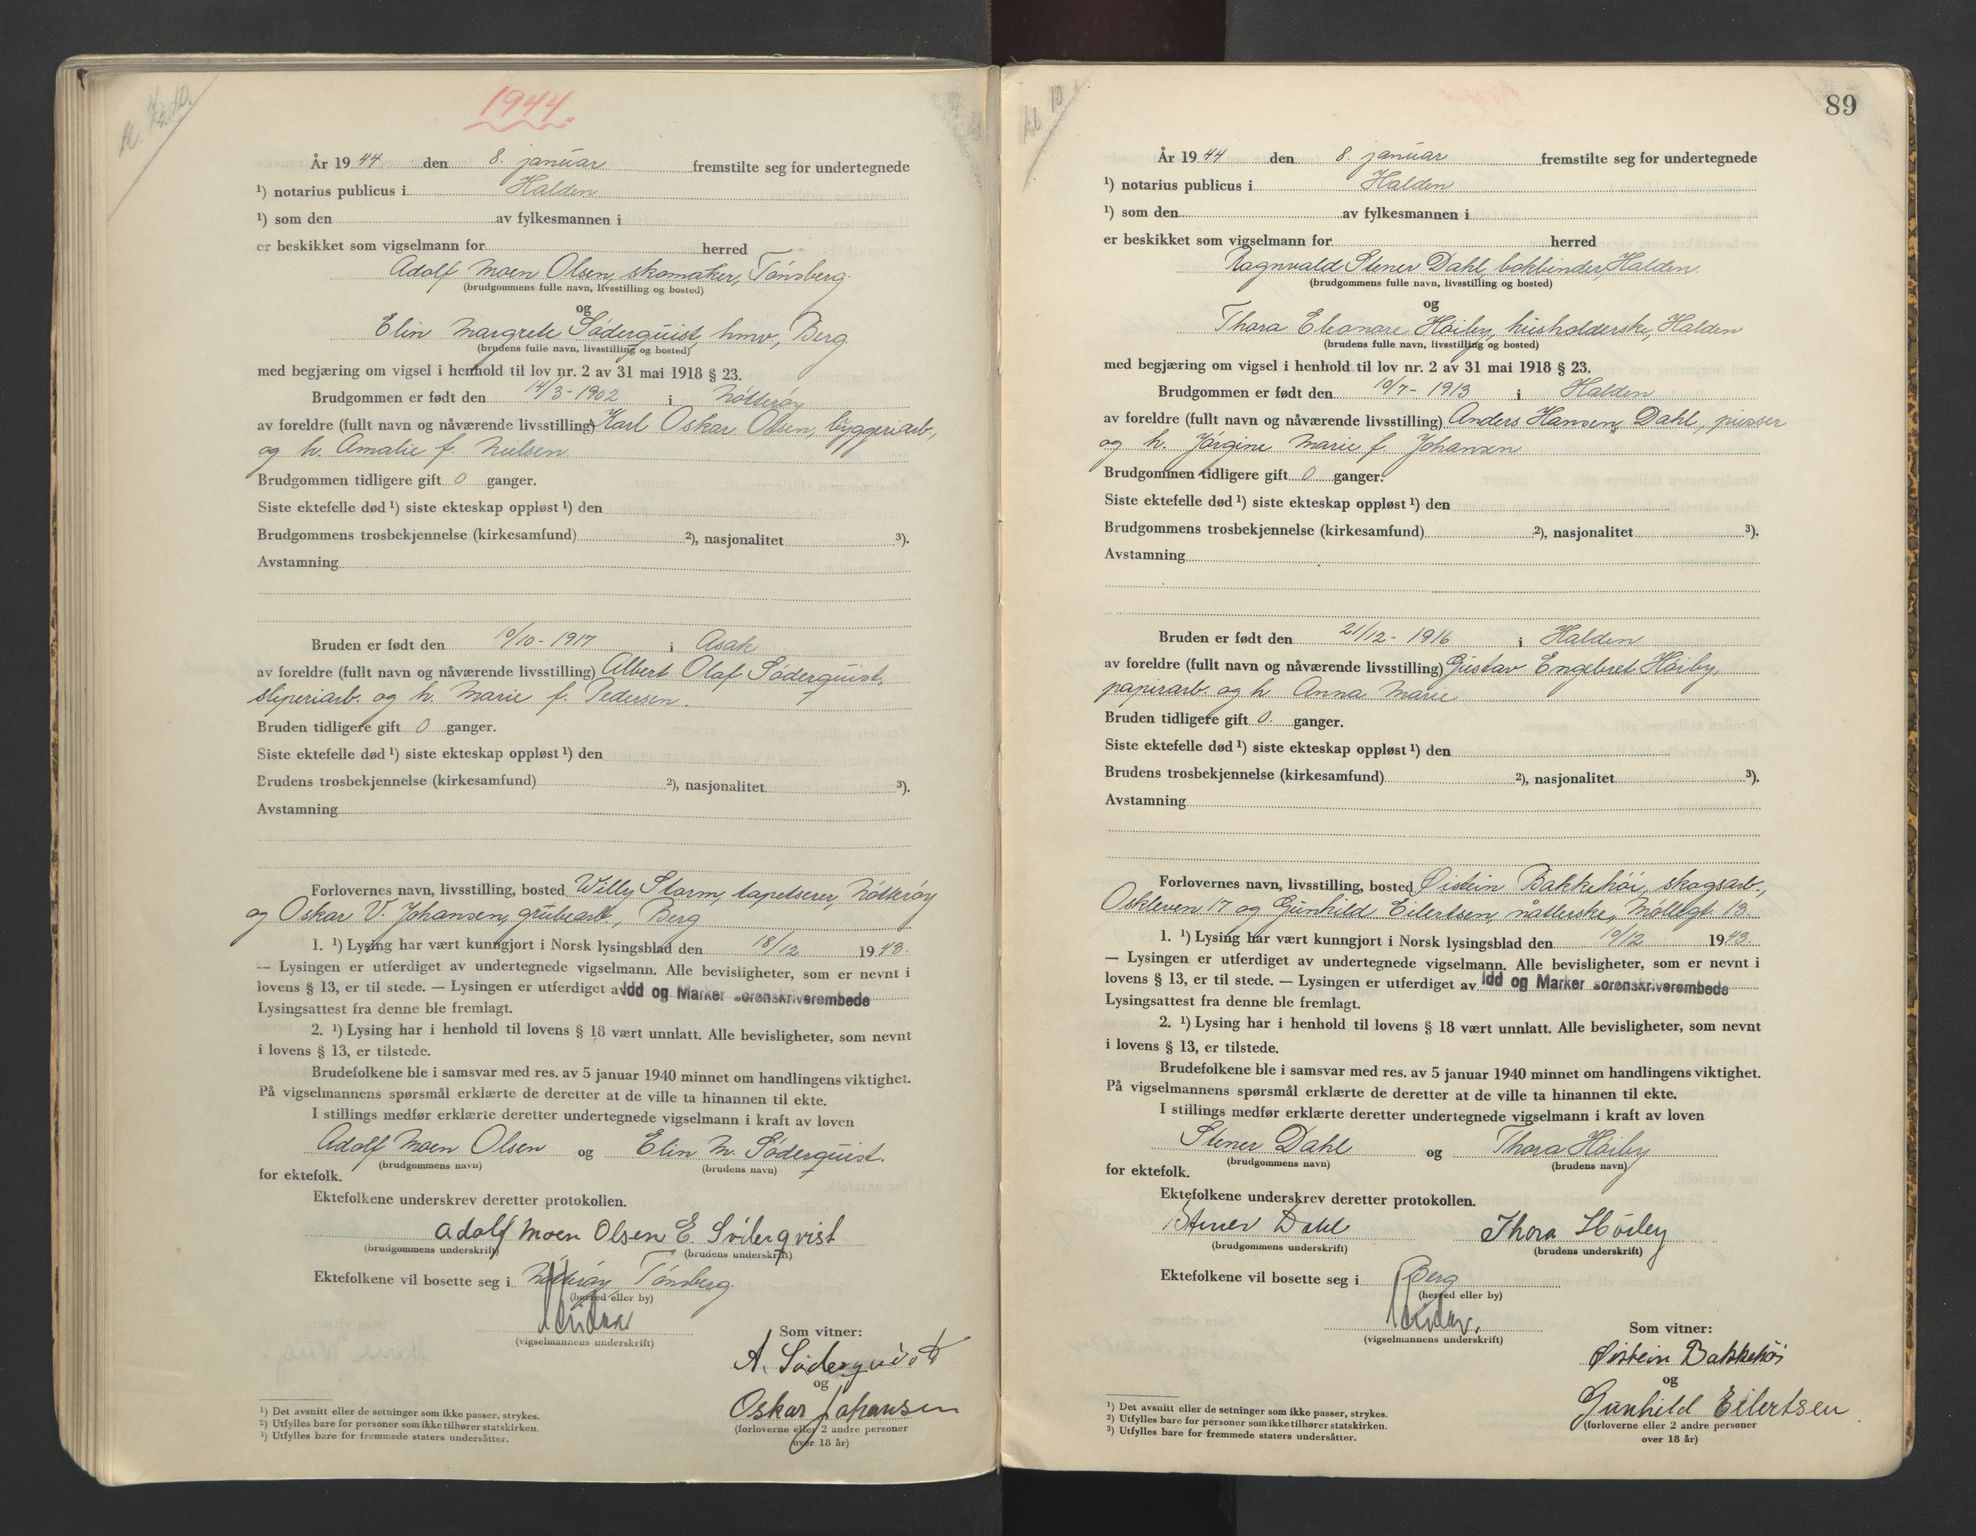 SAO, Idd og Marker sorenskriveri, L/Lc/L0001: Vigselsbøker, 1942-1944, s. 89